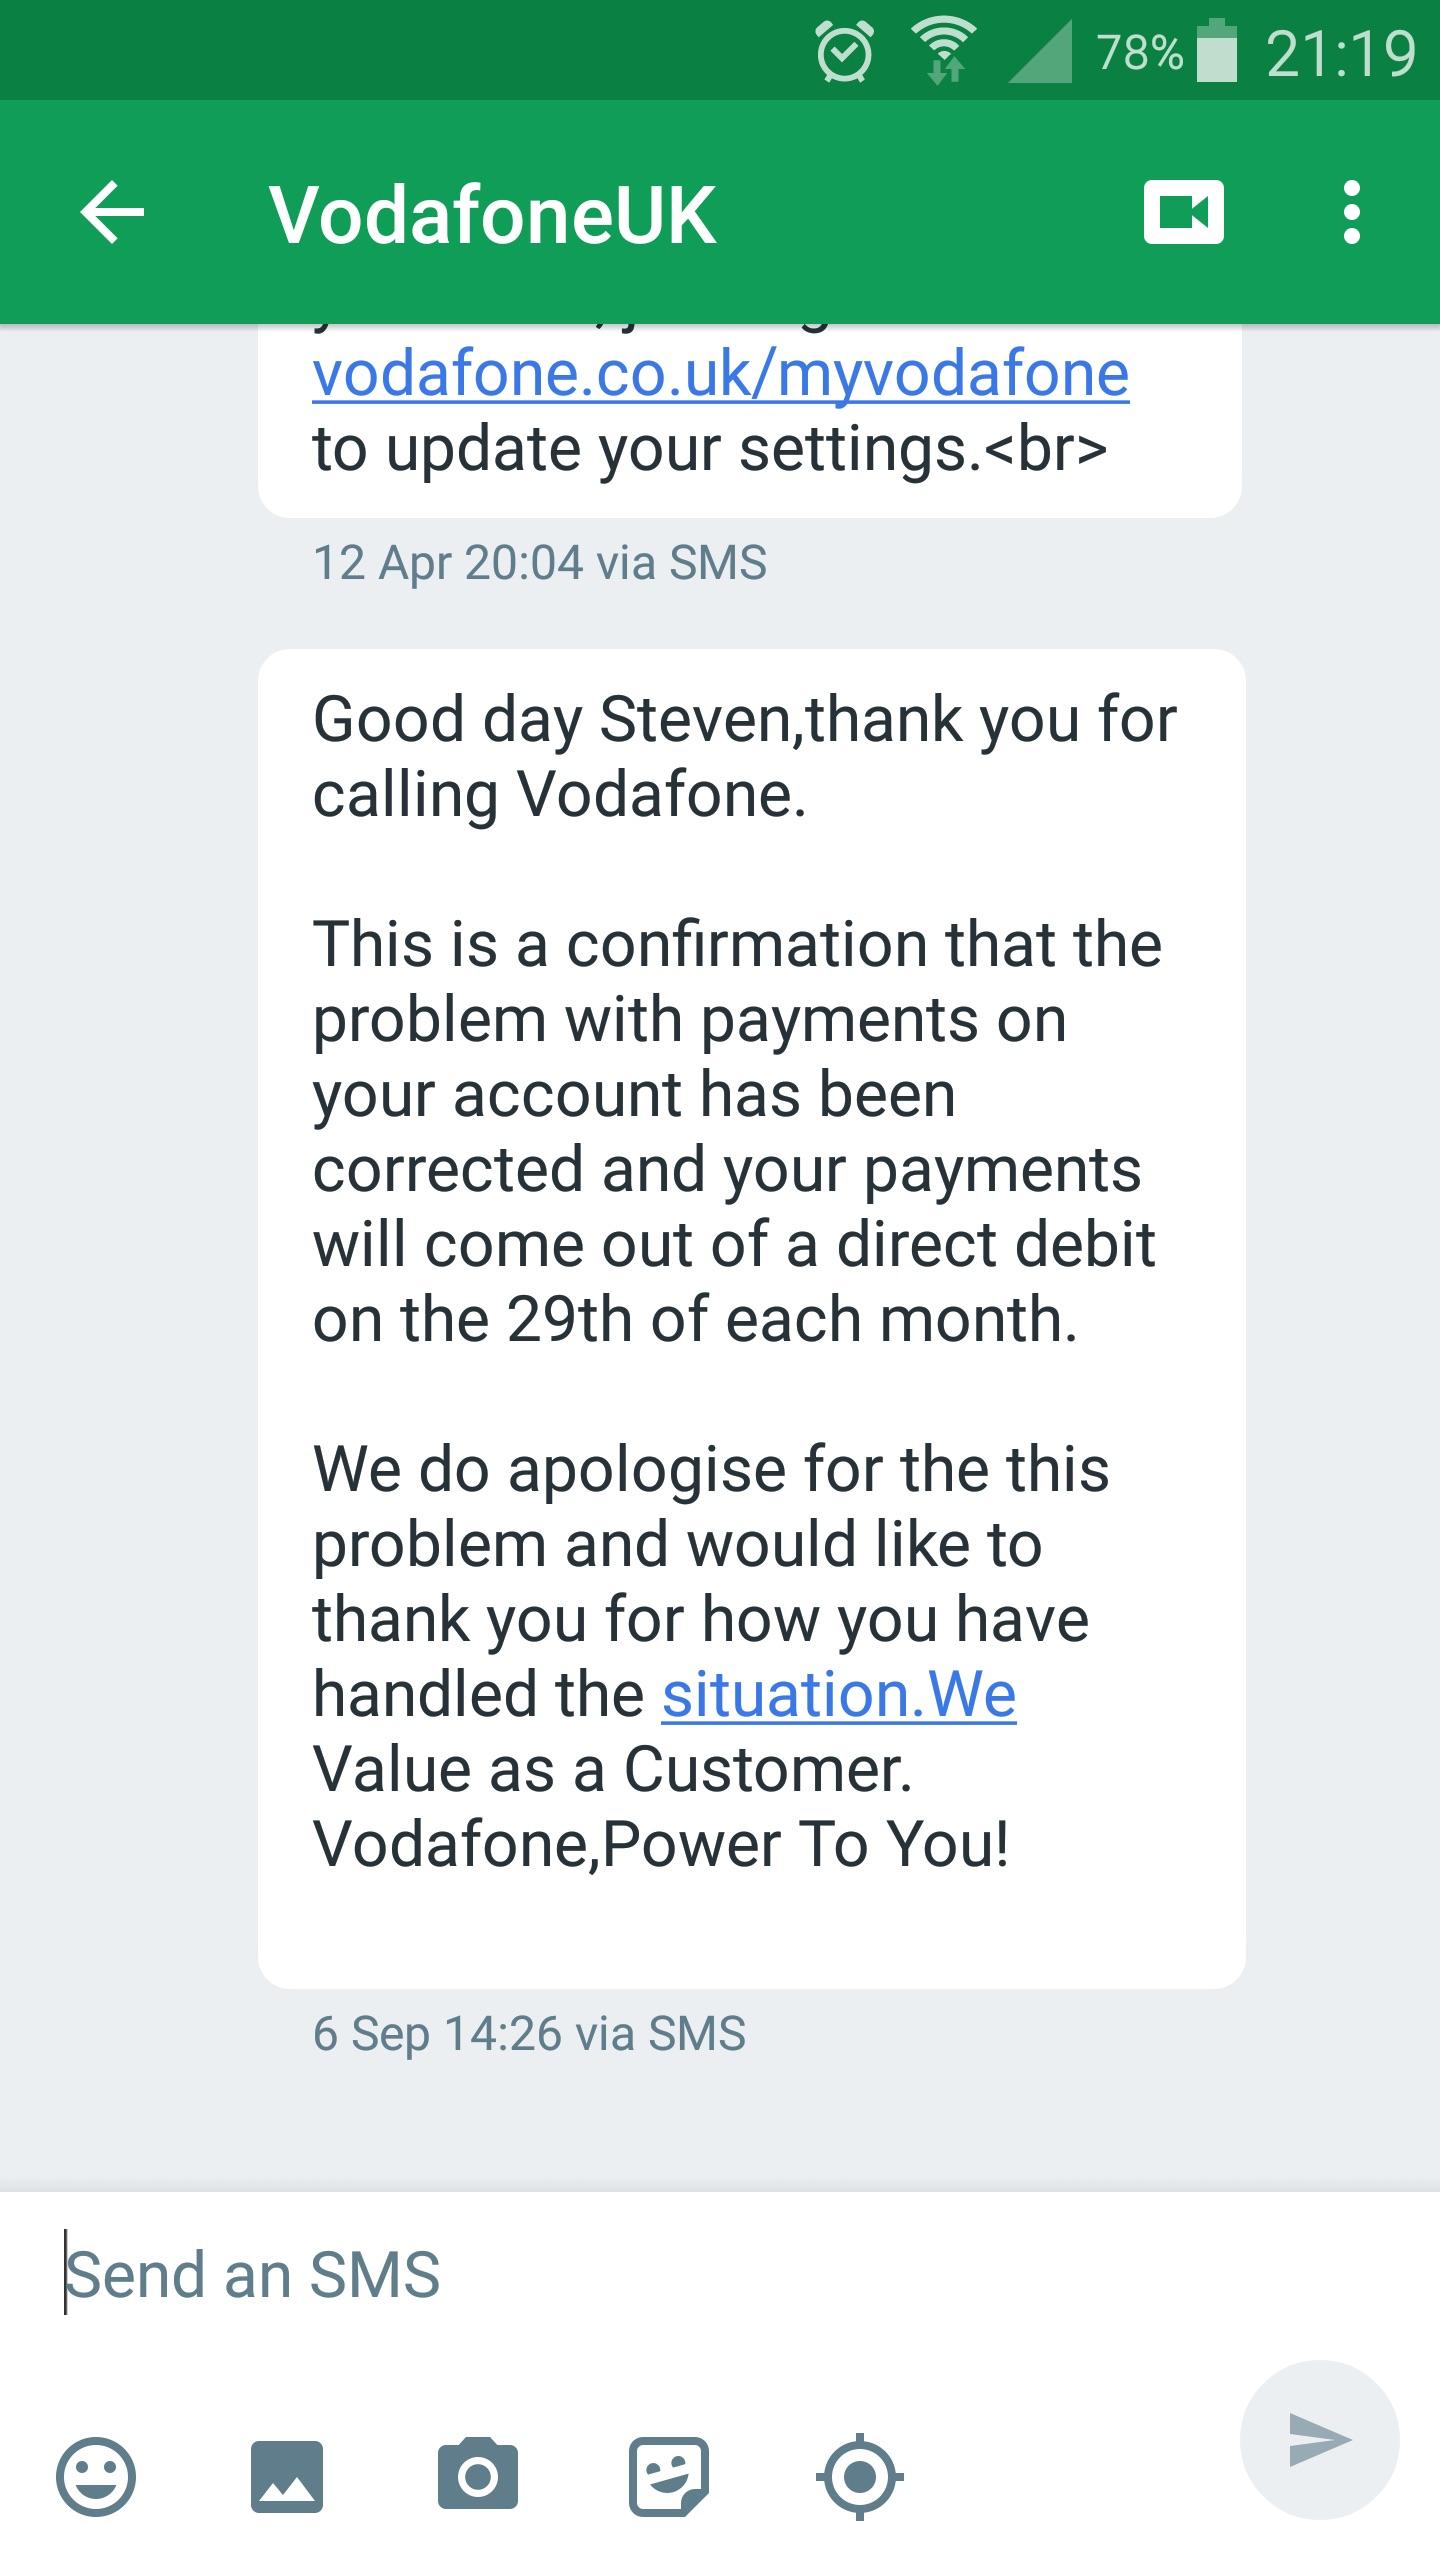 My Vodafone Experience | AVForums